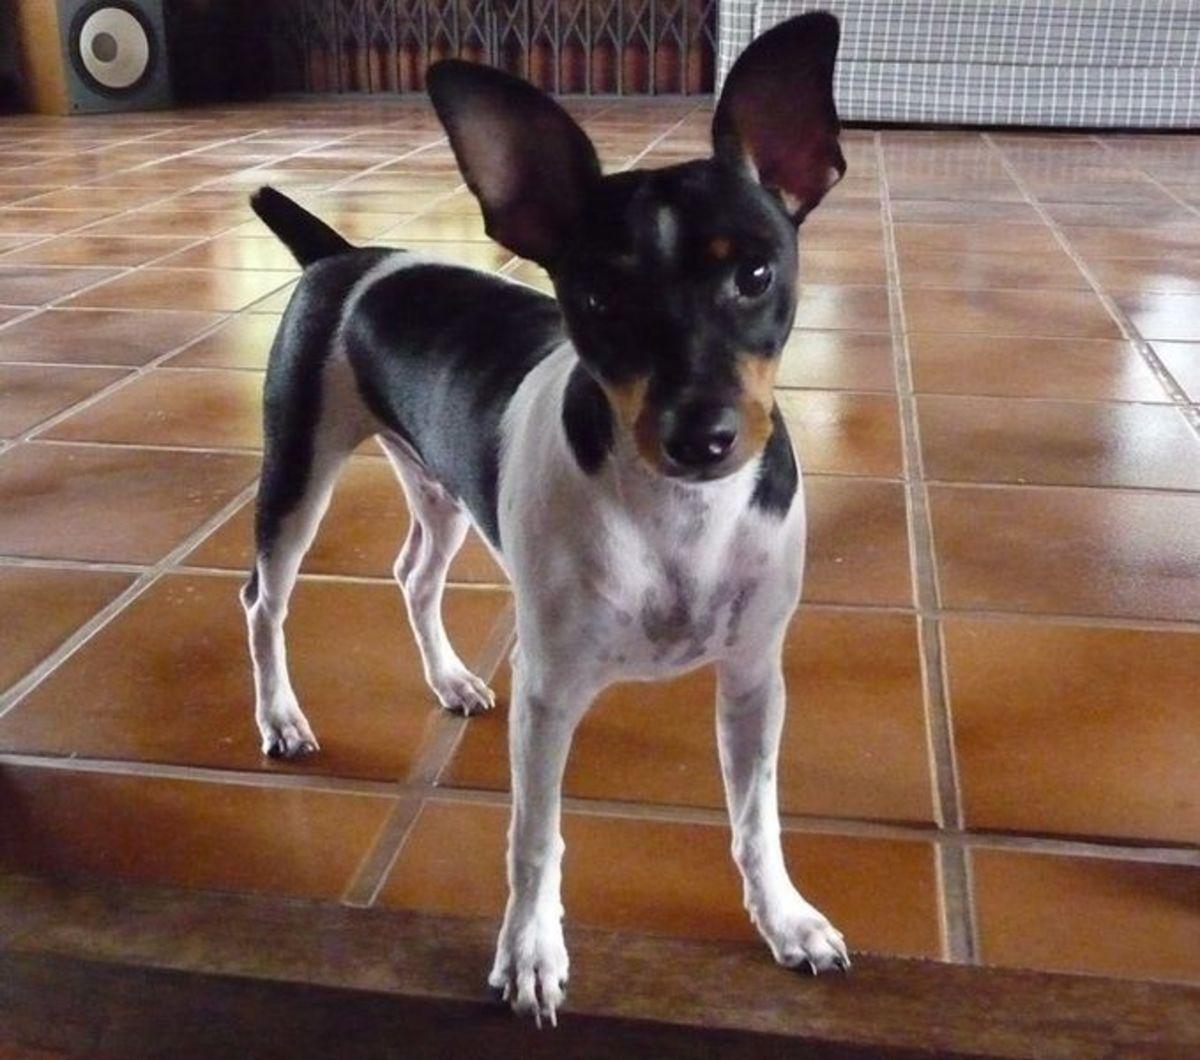 A Brazilian Terrier.